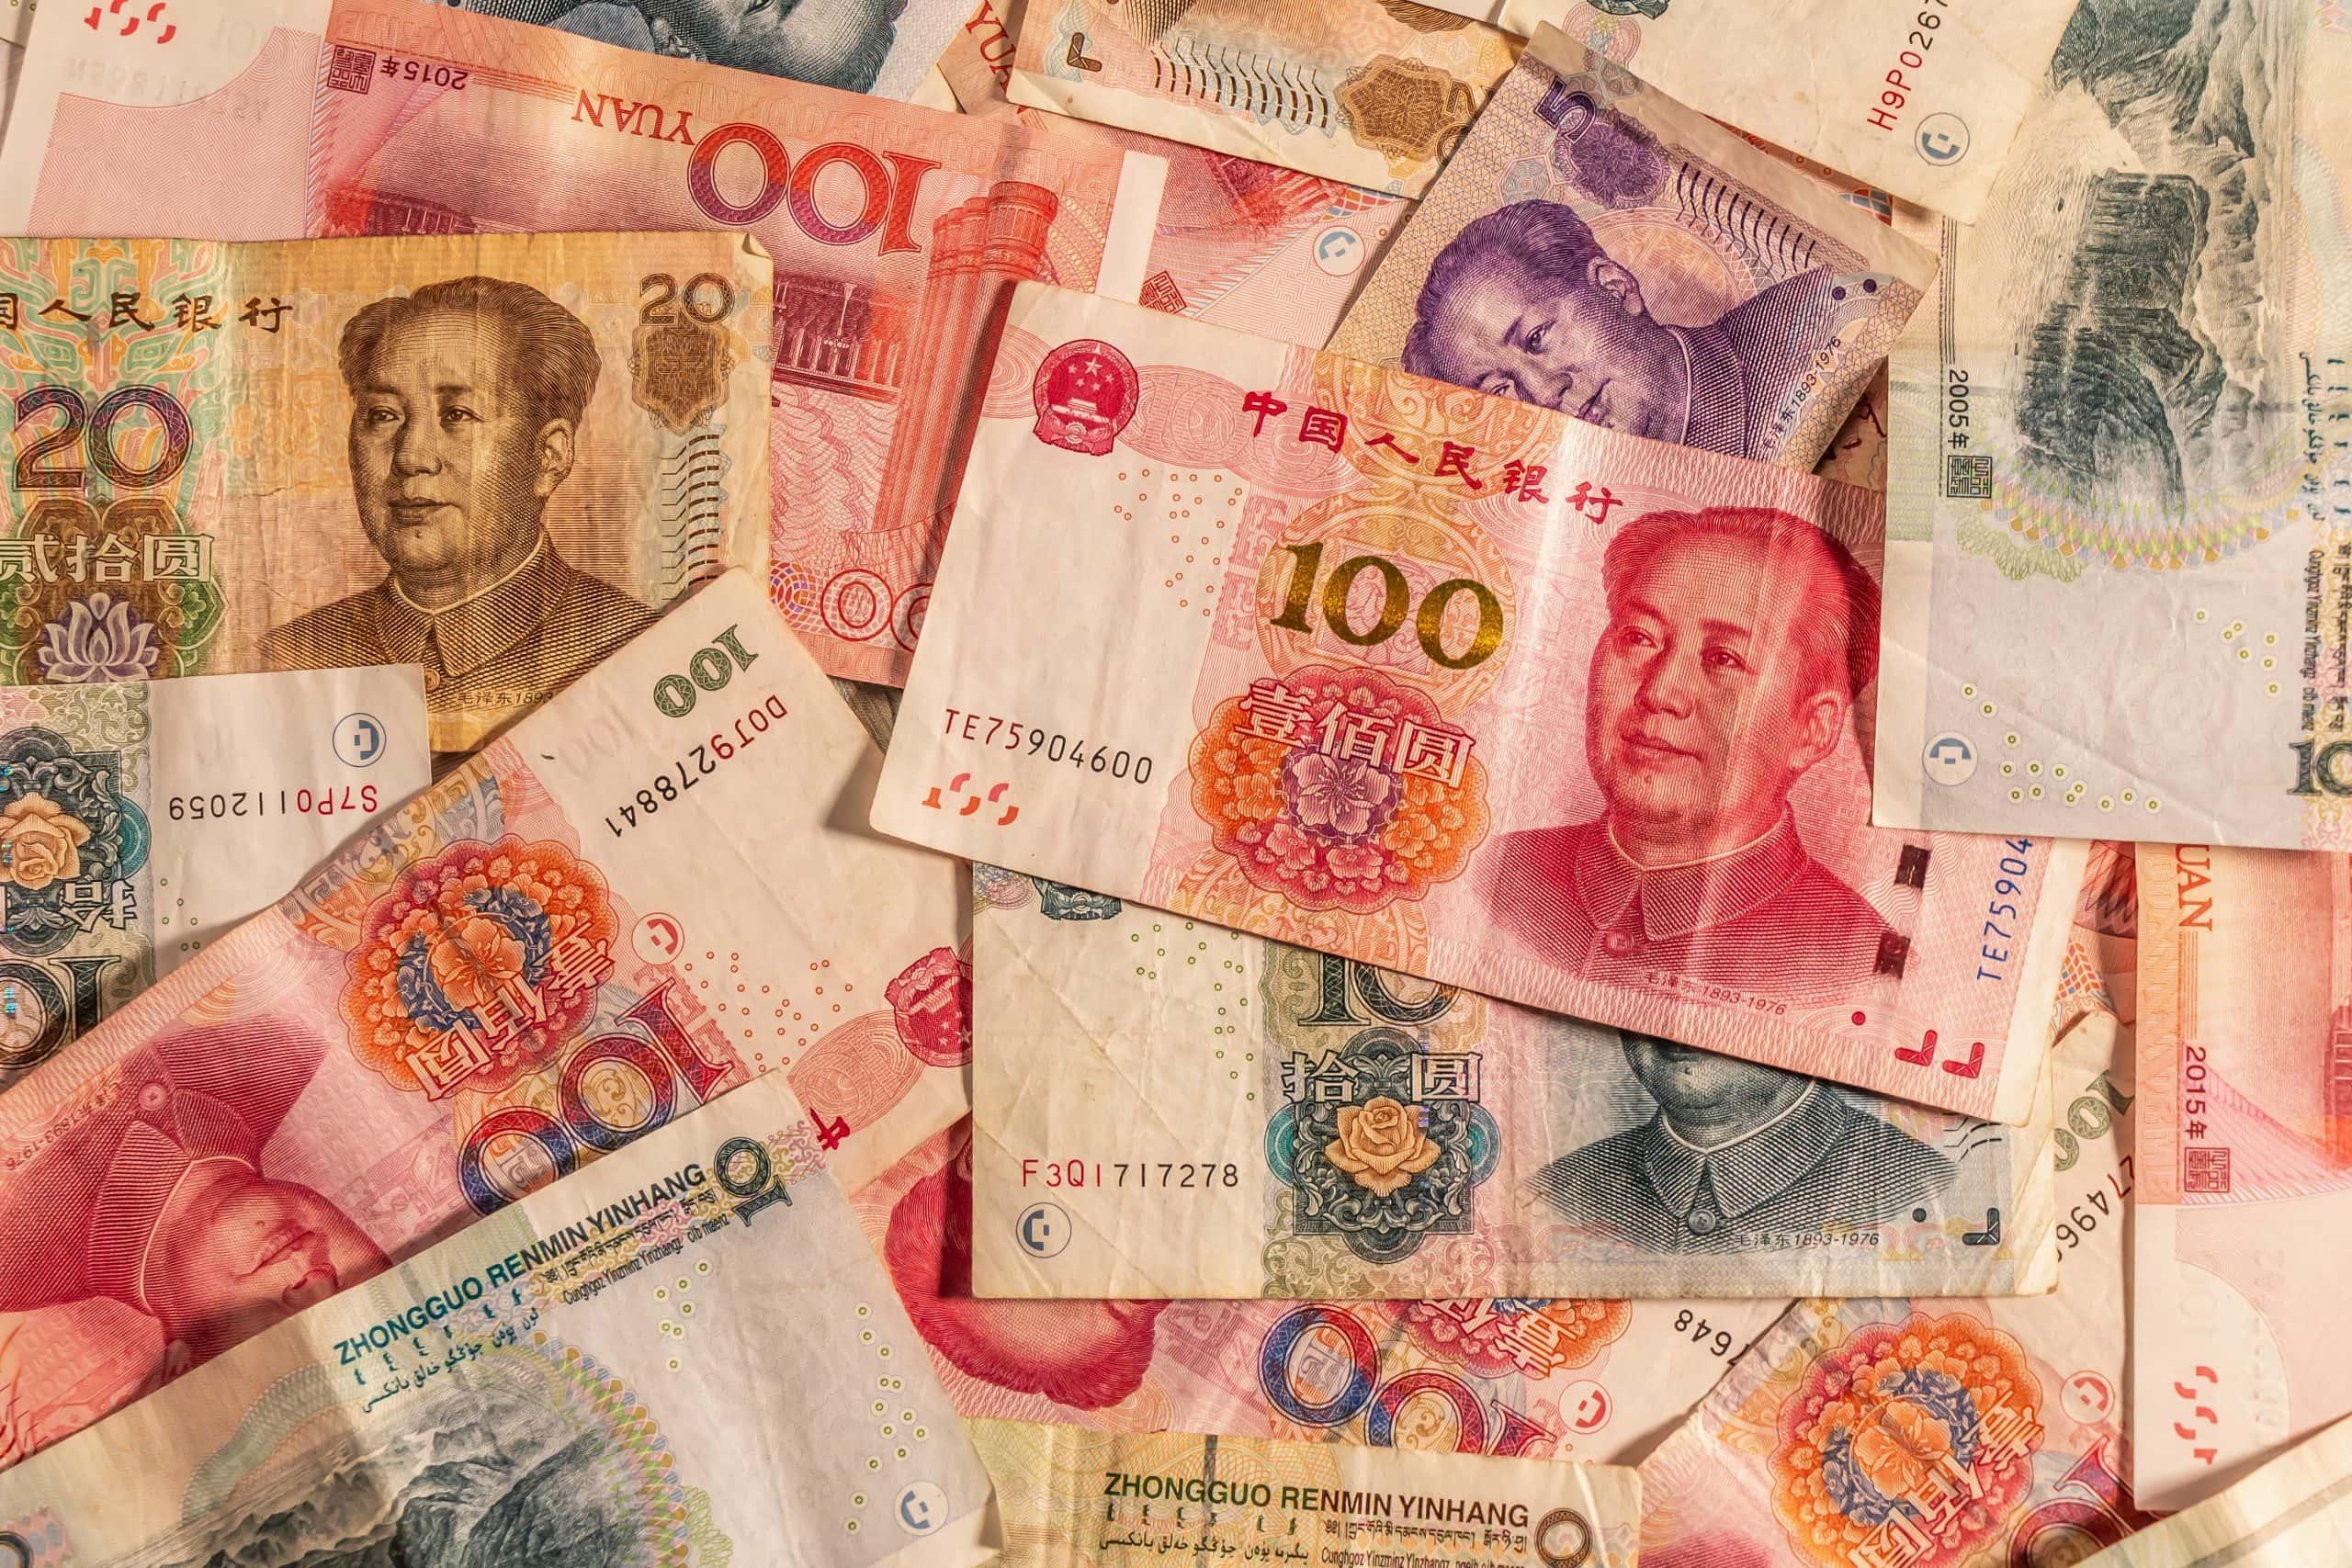 E-yuan instead of BTC: China's prosperity in danger?